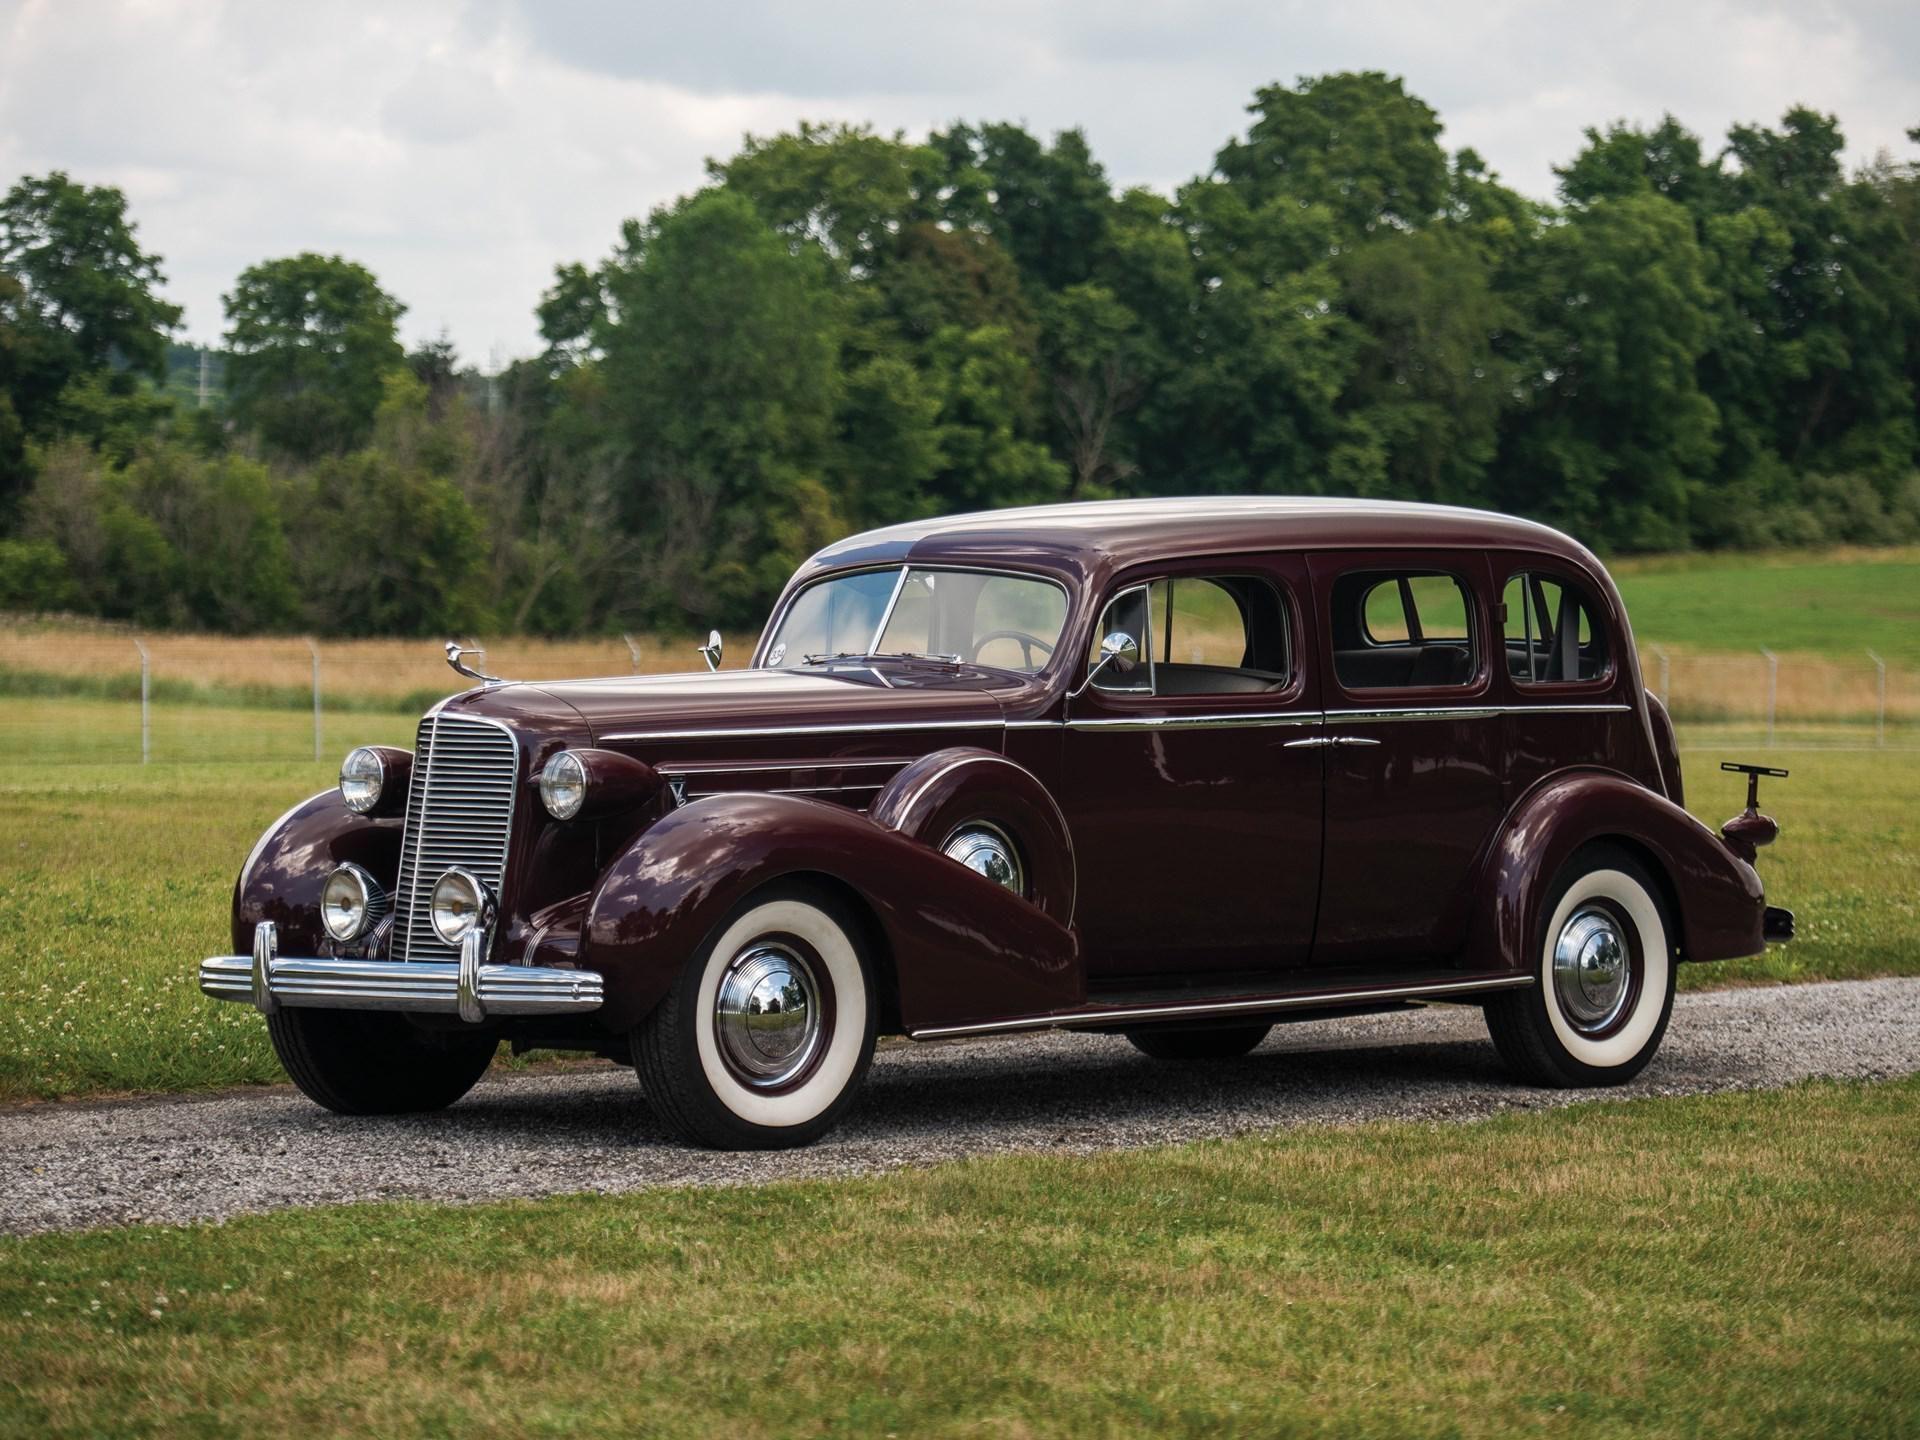 1936 Cadillac Series 85 Seven-Passenger Touring Sedan